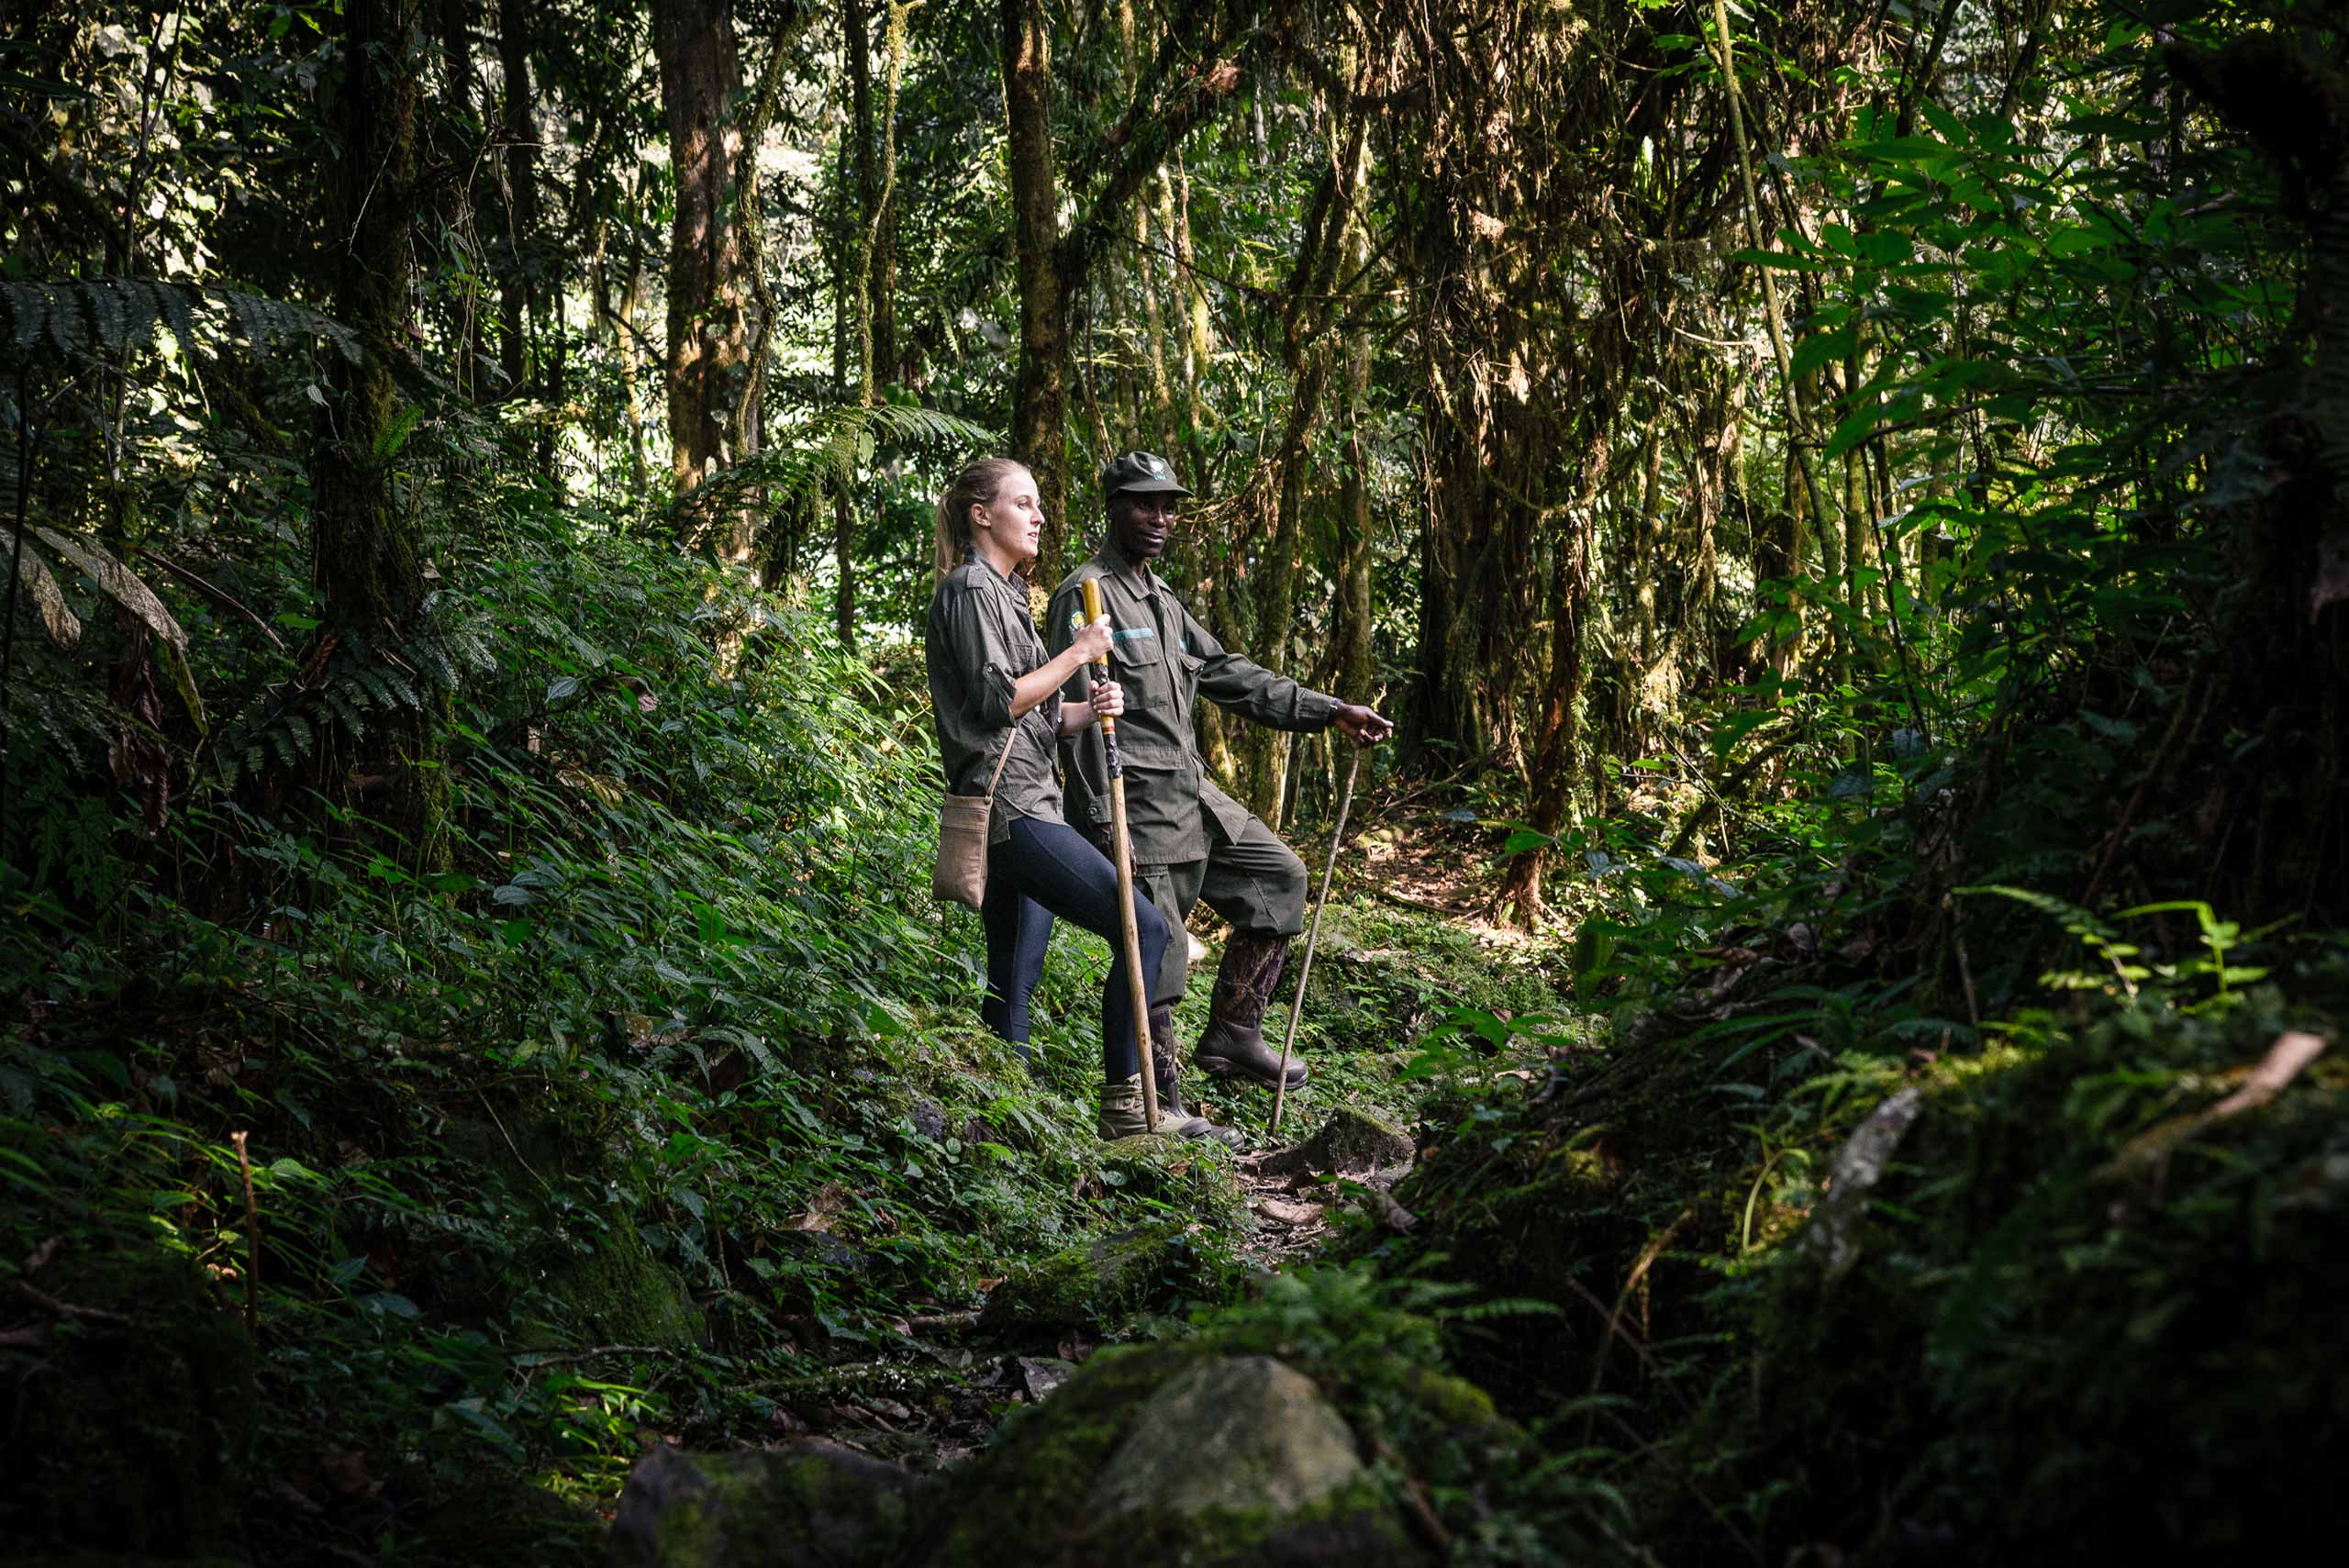 enkosi-africa-safari-uganda-bwindi-impenetrable-gorilla-forest-camp-sanctuary-experience-gorilla-trek